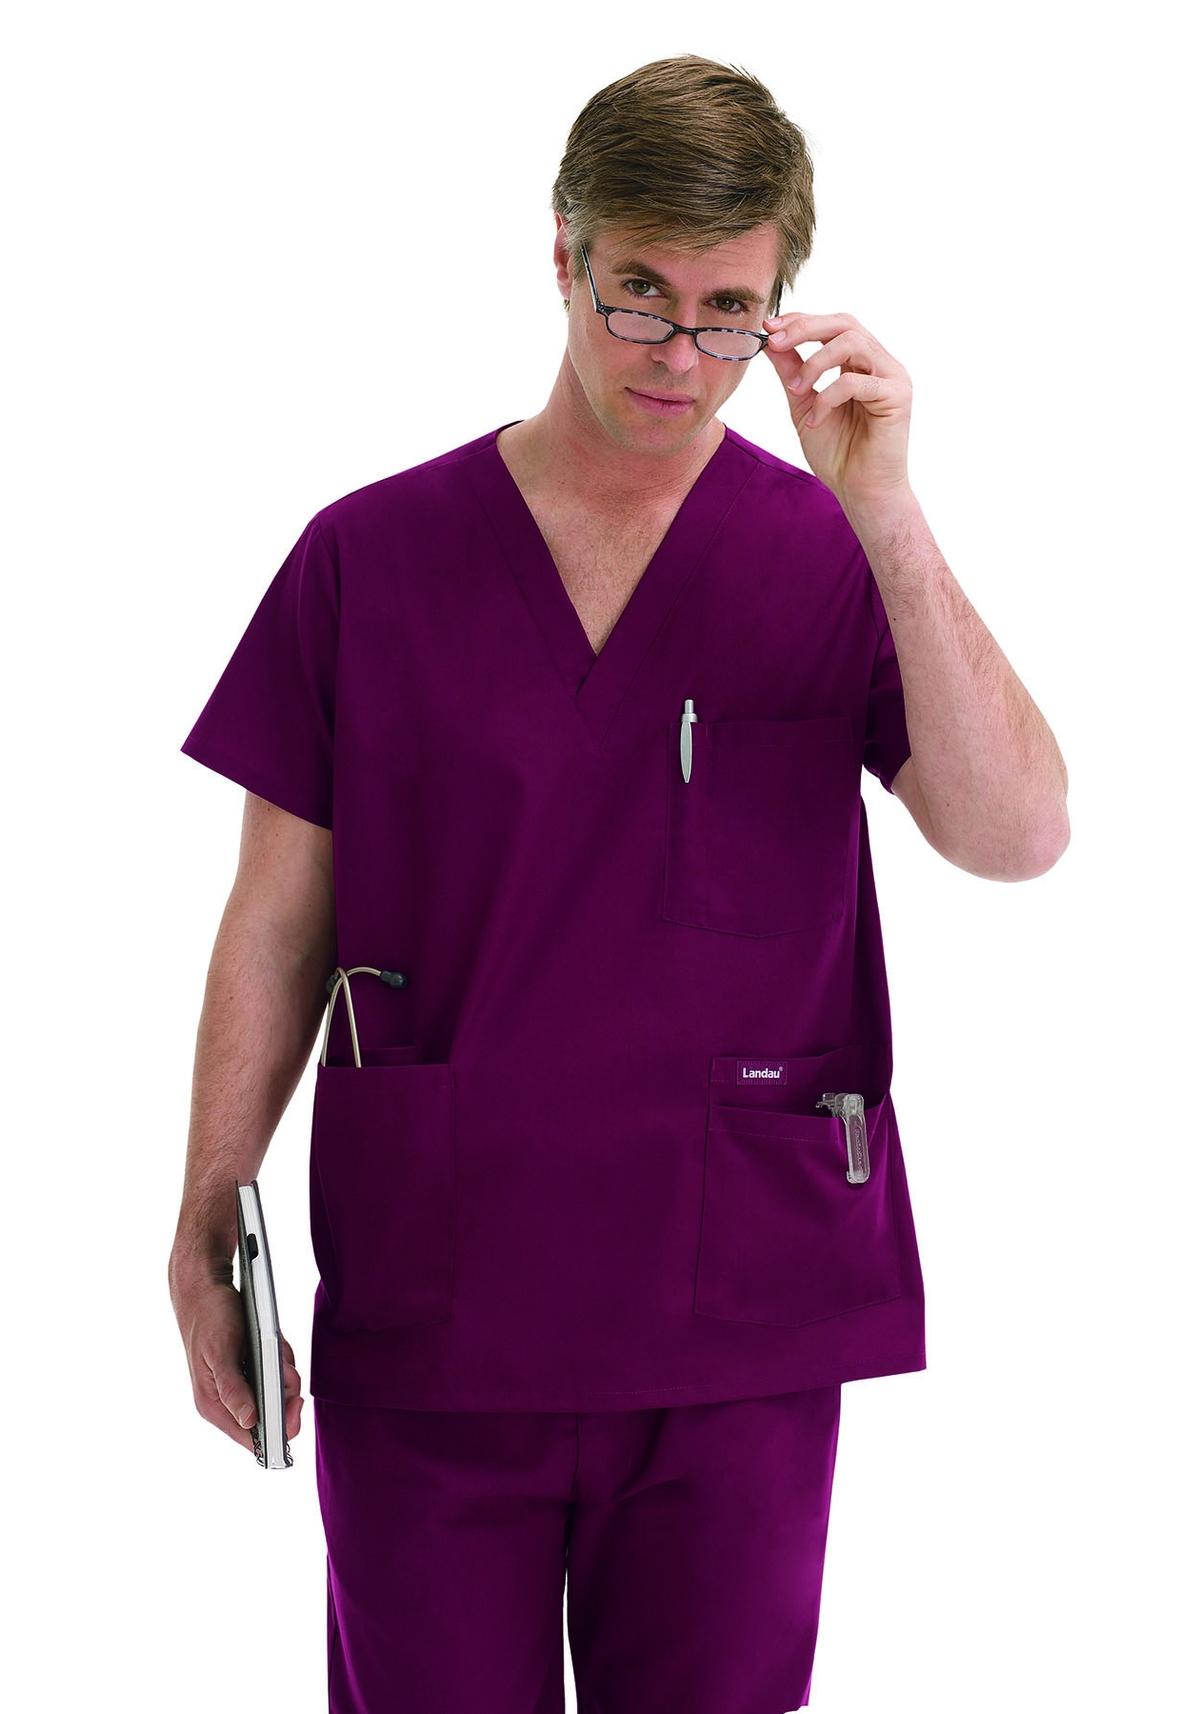 landau guys Redding medical inc equipment and scrubs is a major supplier of littmann stethoscopes, welch allyn diagnostics, seca scales, nursing equipment, such as blood pressure units, thermometers, vital signs, ekg, dopplers.